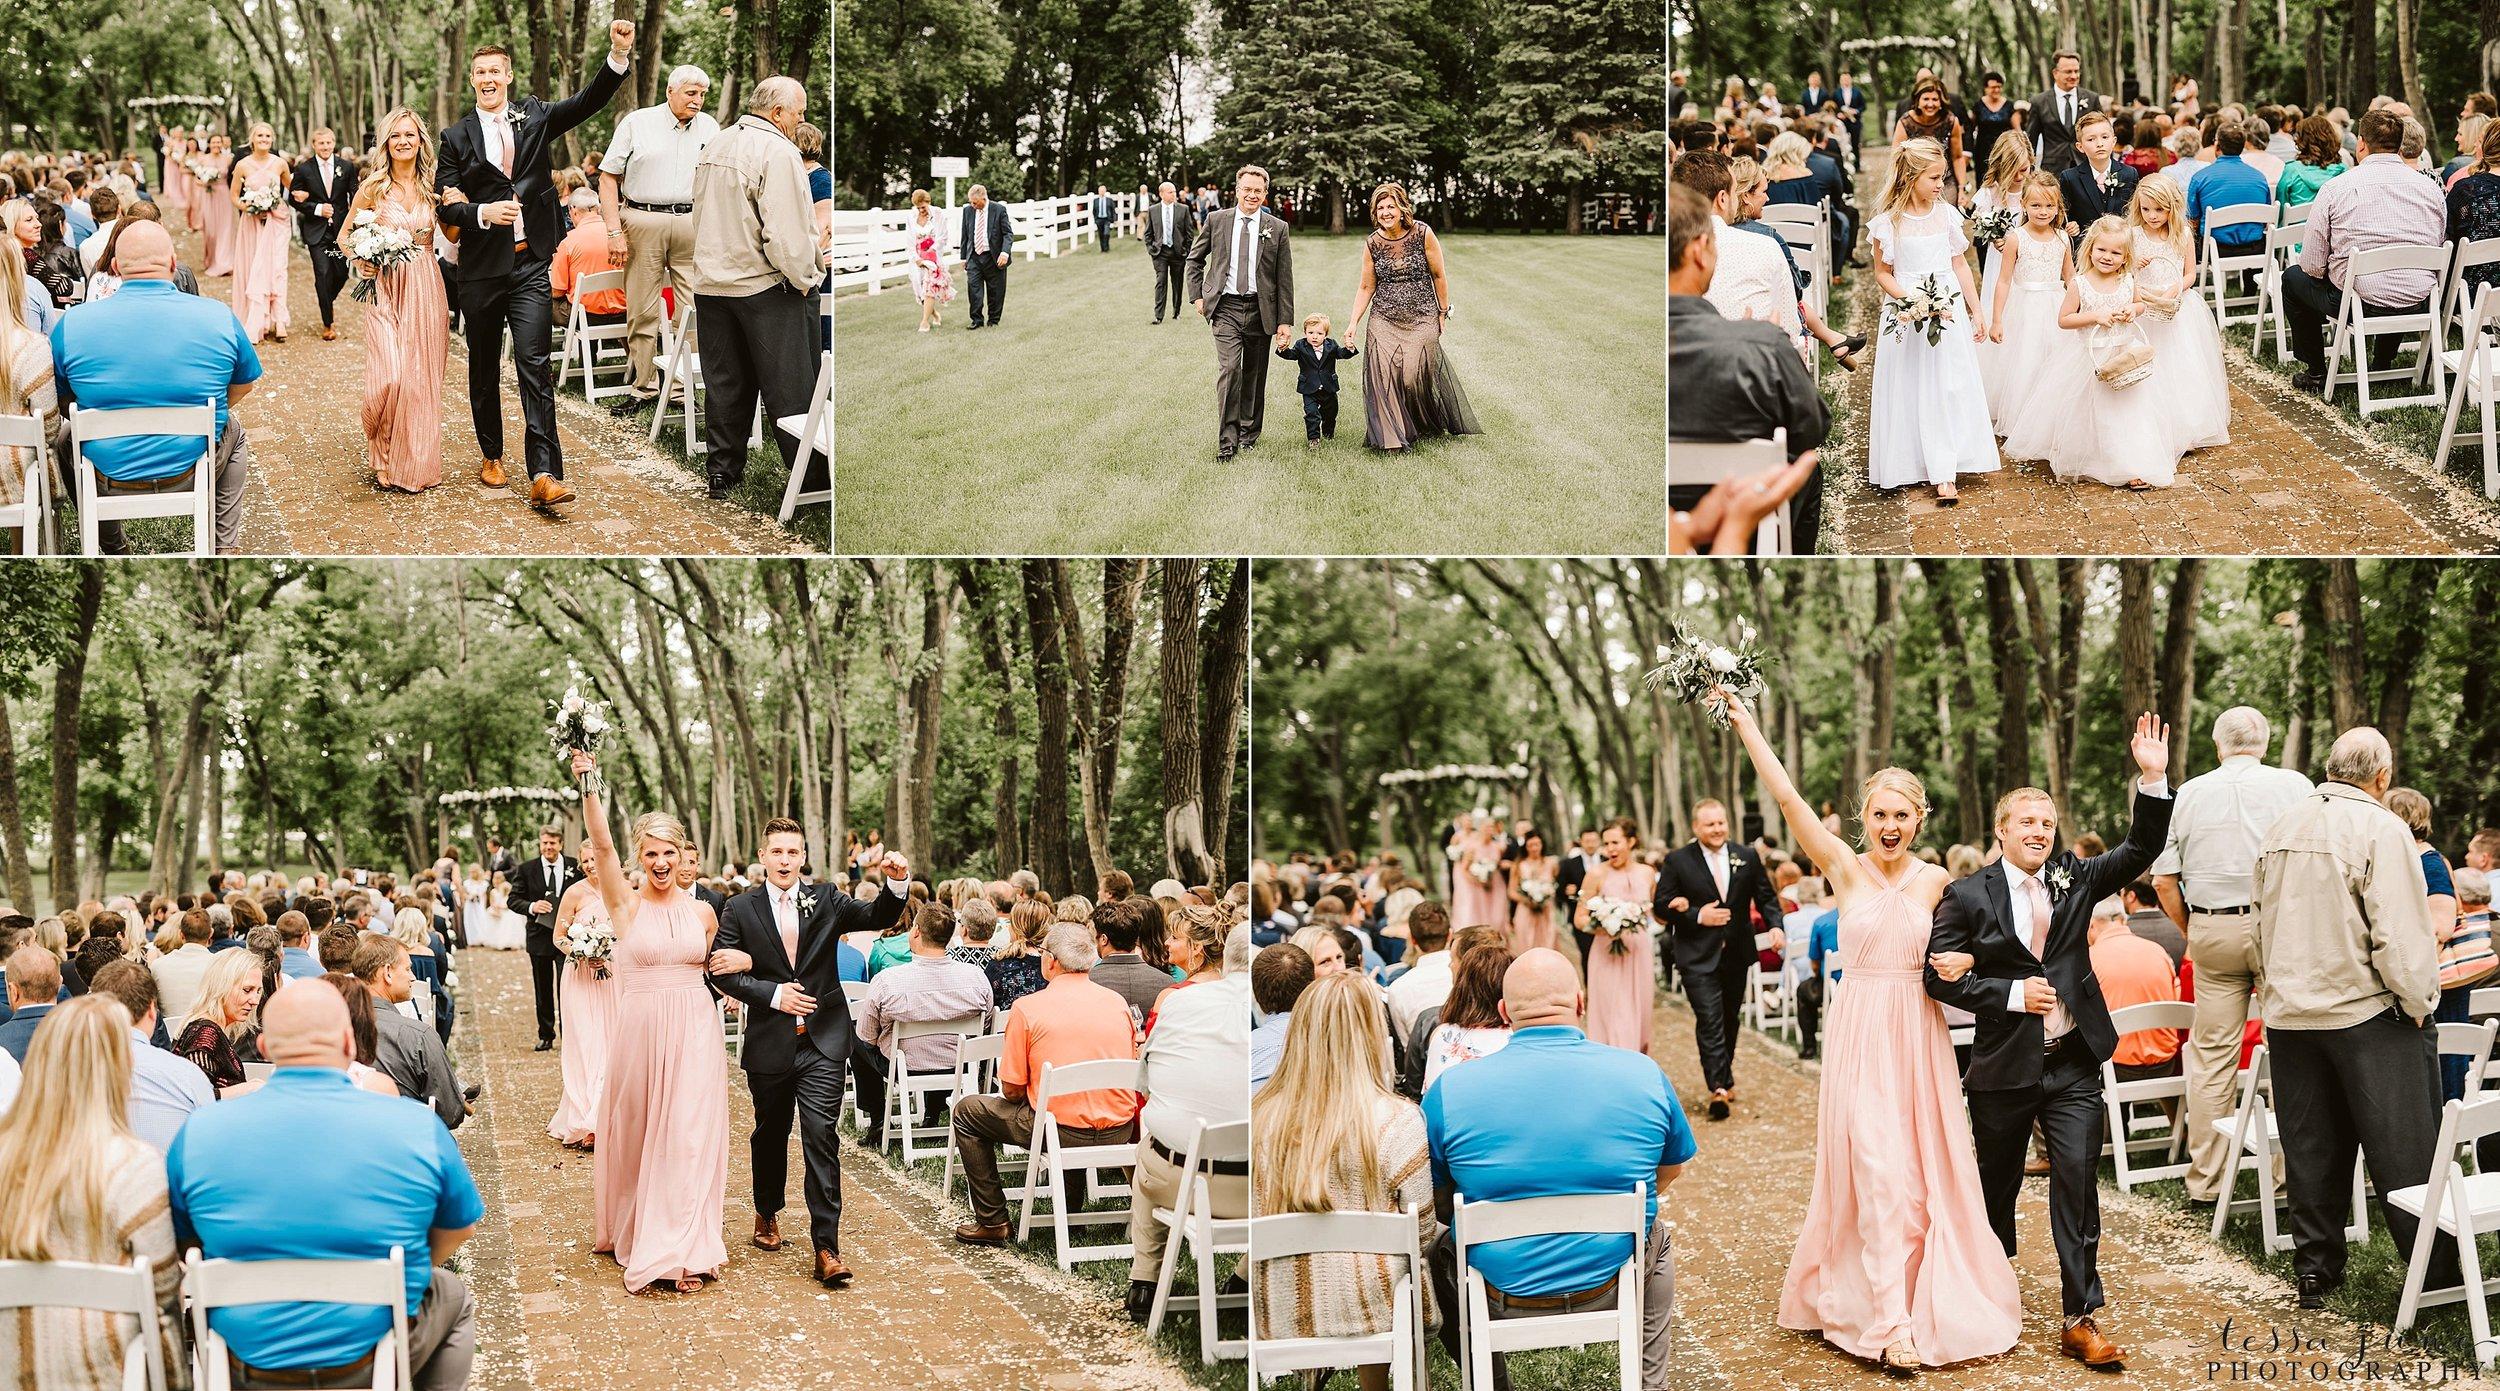 carlos-creek-winery-wedding-summer-pristine-floral-blush-pink-navy-alexandria-minnesota-127.jpg